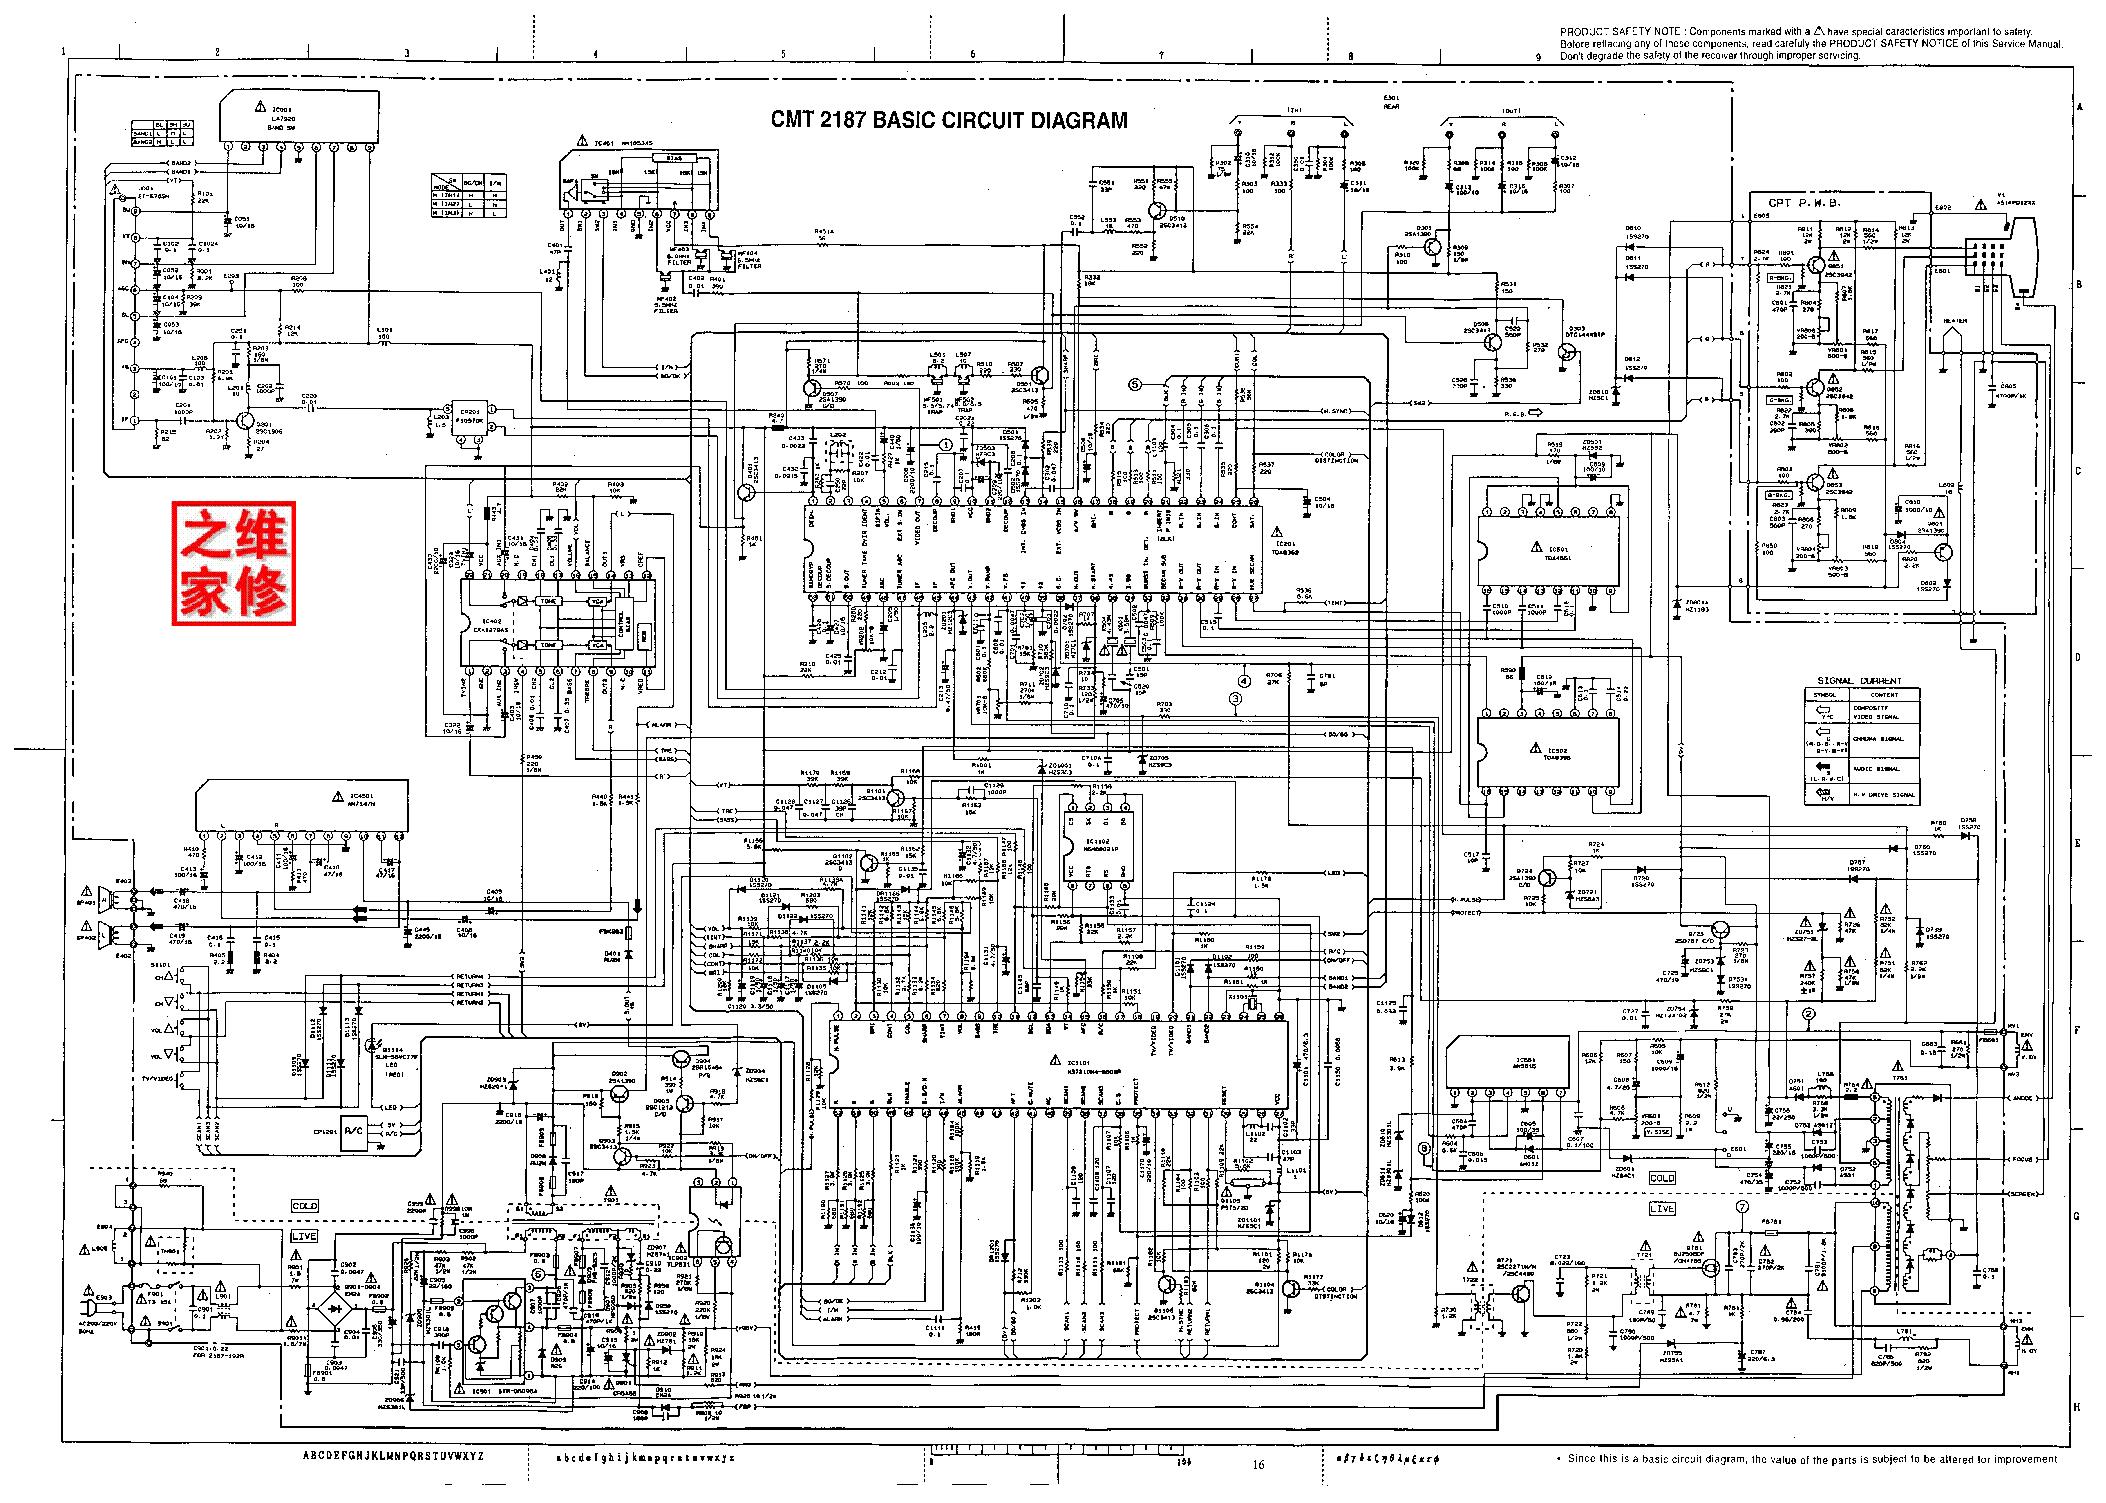 Auto Blog Repair Manual September 2017 2000 Gtp Wiring Diagram Free Download Schematic Fazendasruralcombr Sony Tv